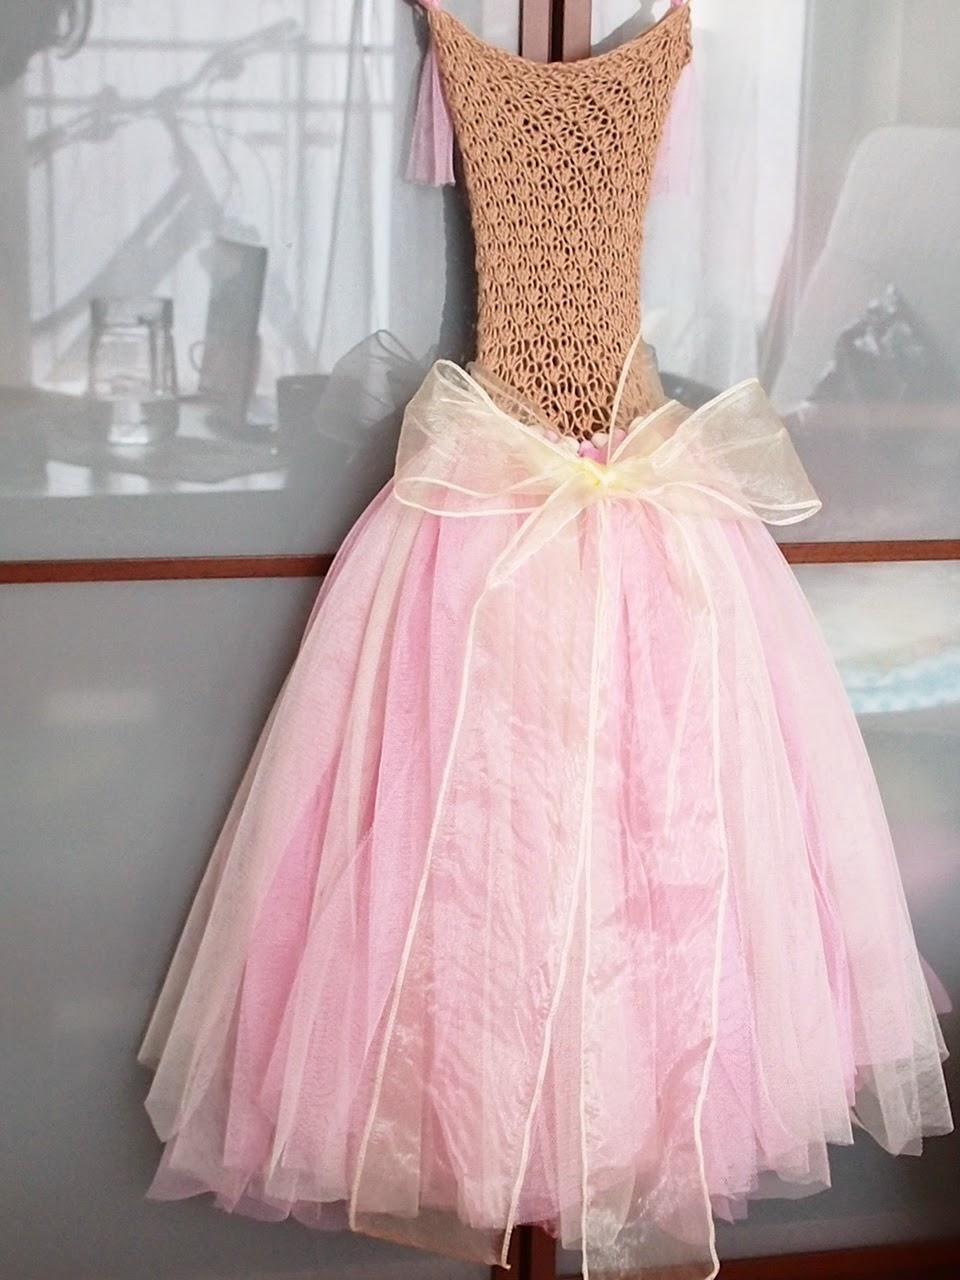 ced0d9966179 Το φόρεμα της μικρής